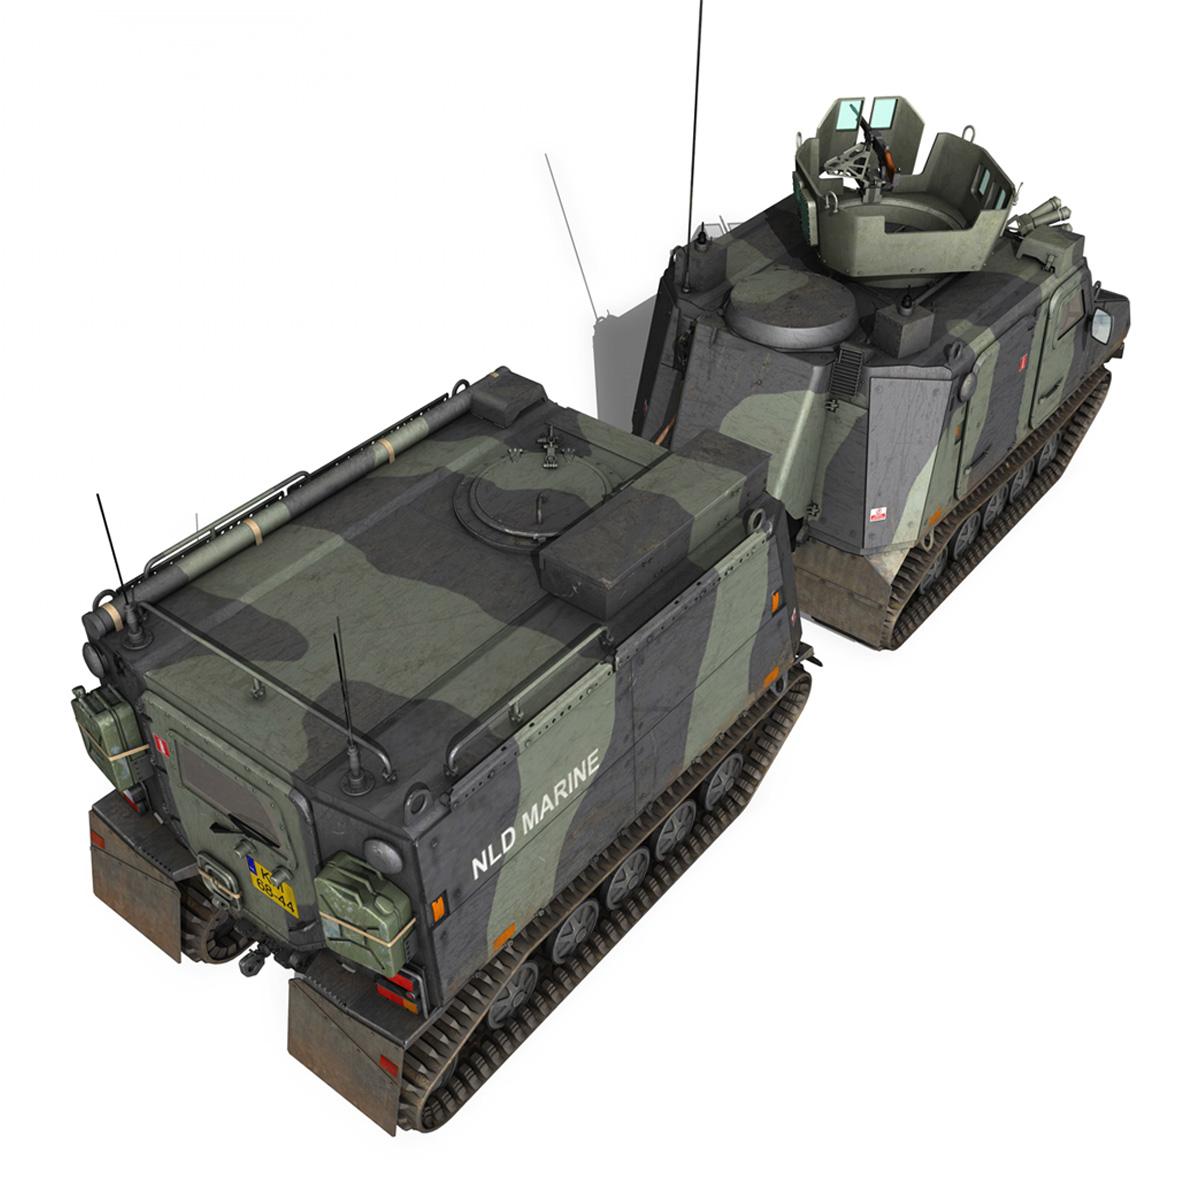 bvs10 viking – netherlands marine corps 3d model 3ds c4d lwo obj 293521